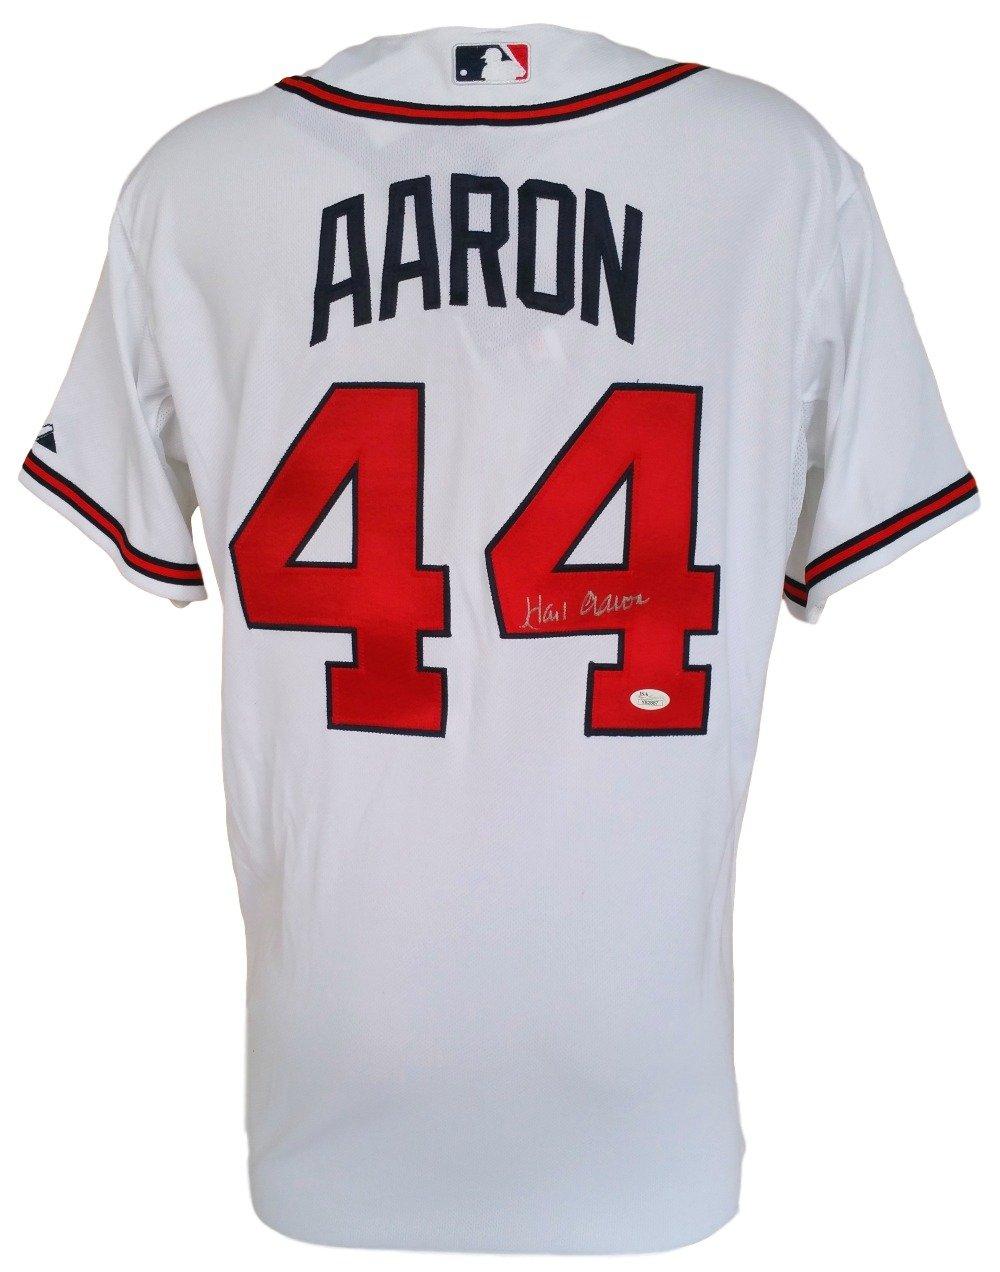 on sale 0939b 07cf2 Hank Aaron Signed Atlanta Braves White Authentic Majestic ...